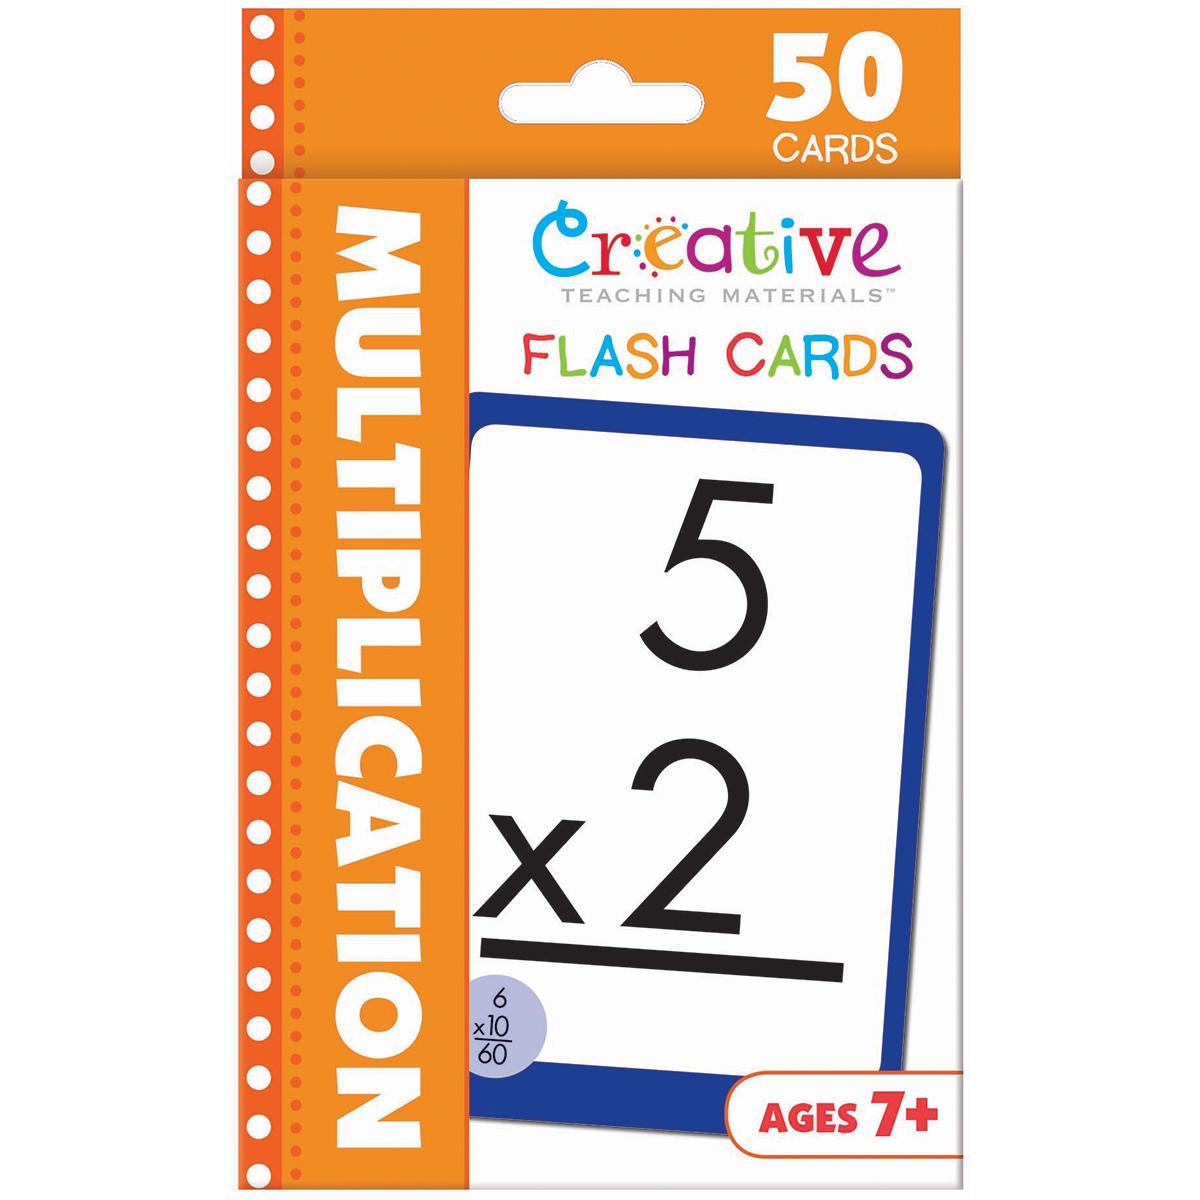 Creative Teaching Materials Flash Cards-Multiplication 50/pkg - Walmart